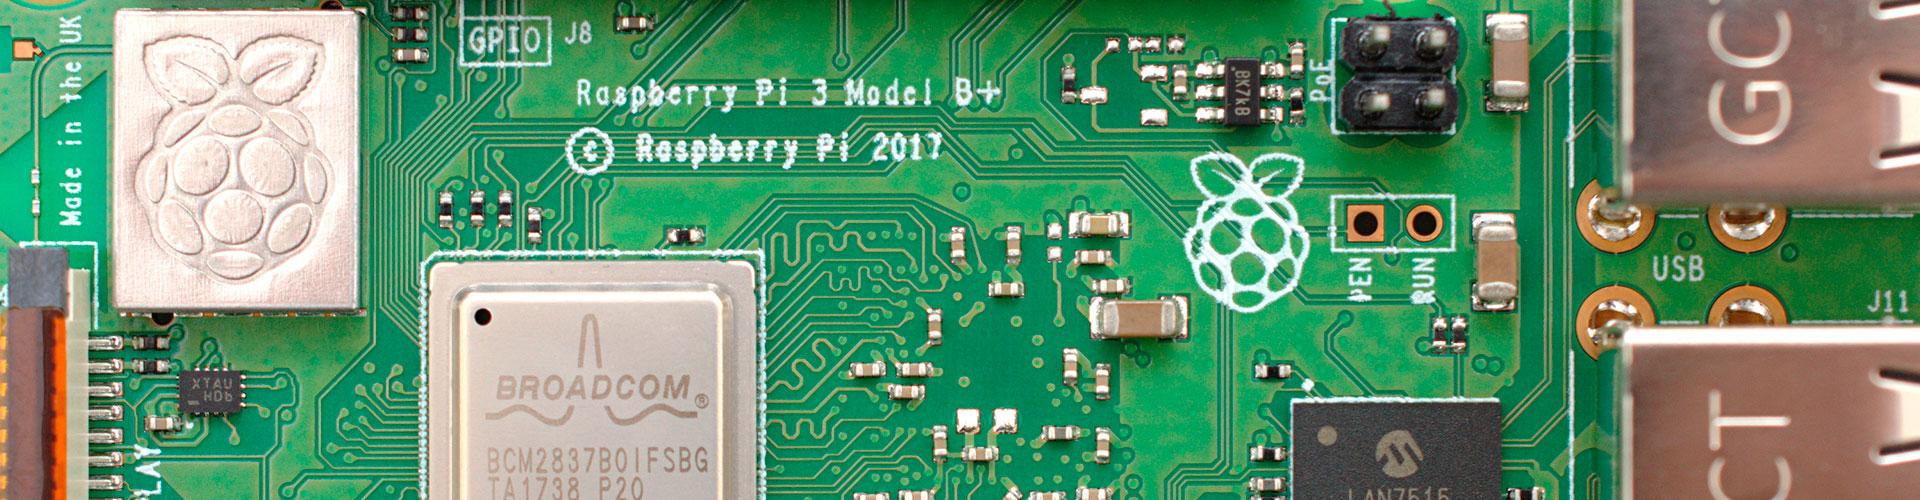 """Taller Innova +: Programació de butxaca amb Raspberry Pi"""